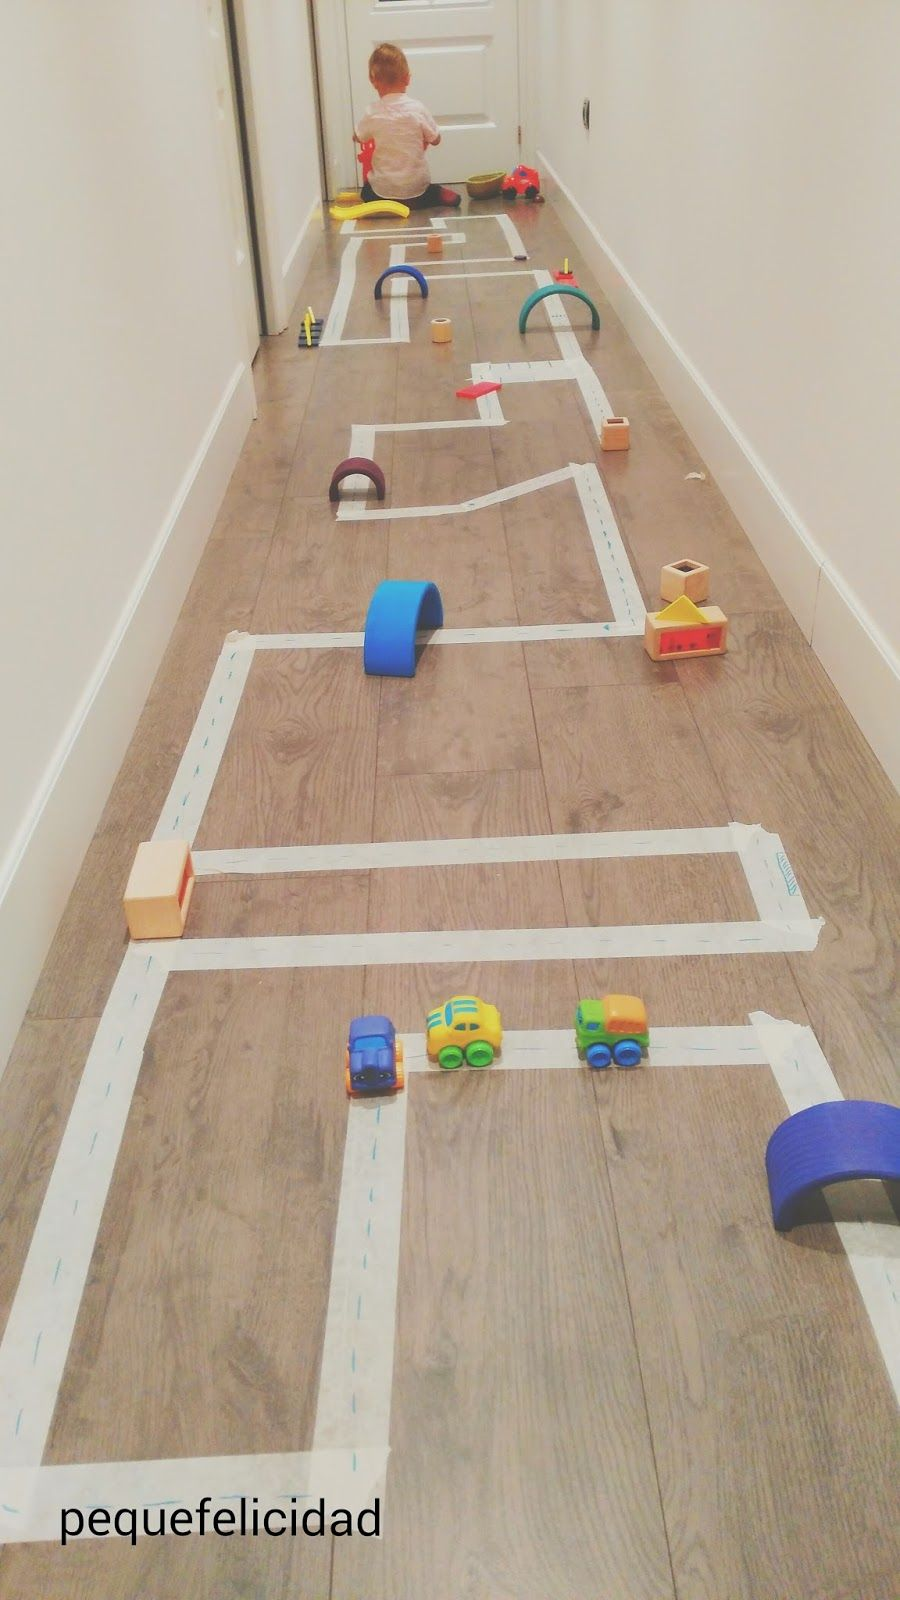 Circuito Juegos Para Niños : Juego circuito de agua botellas embudos buscar con google